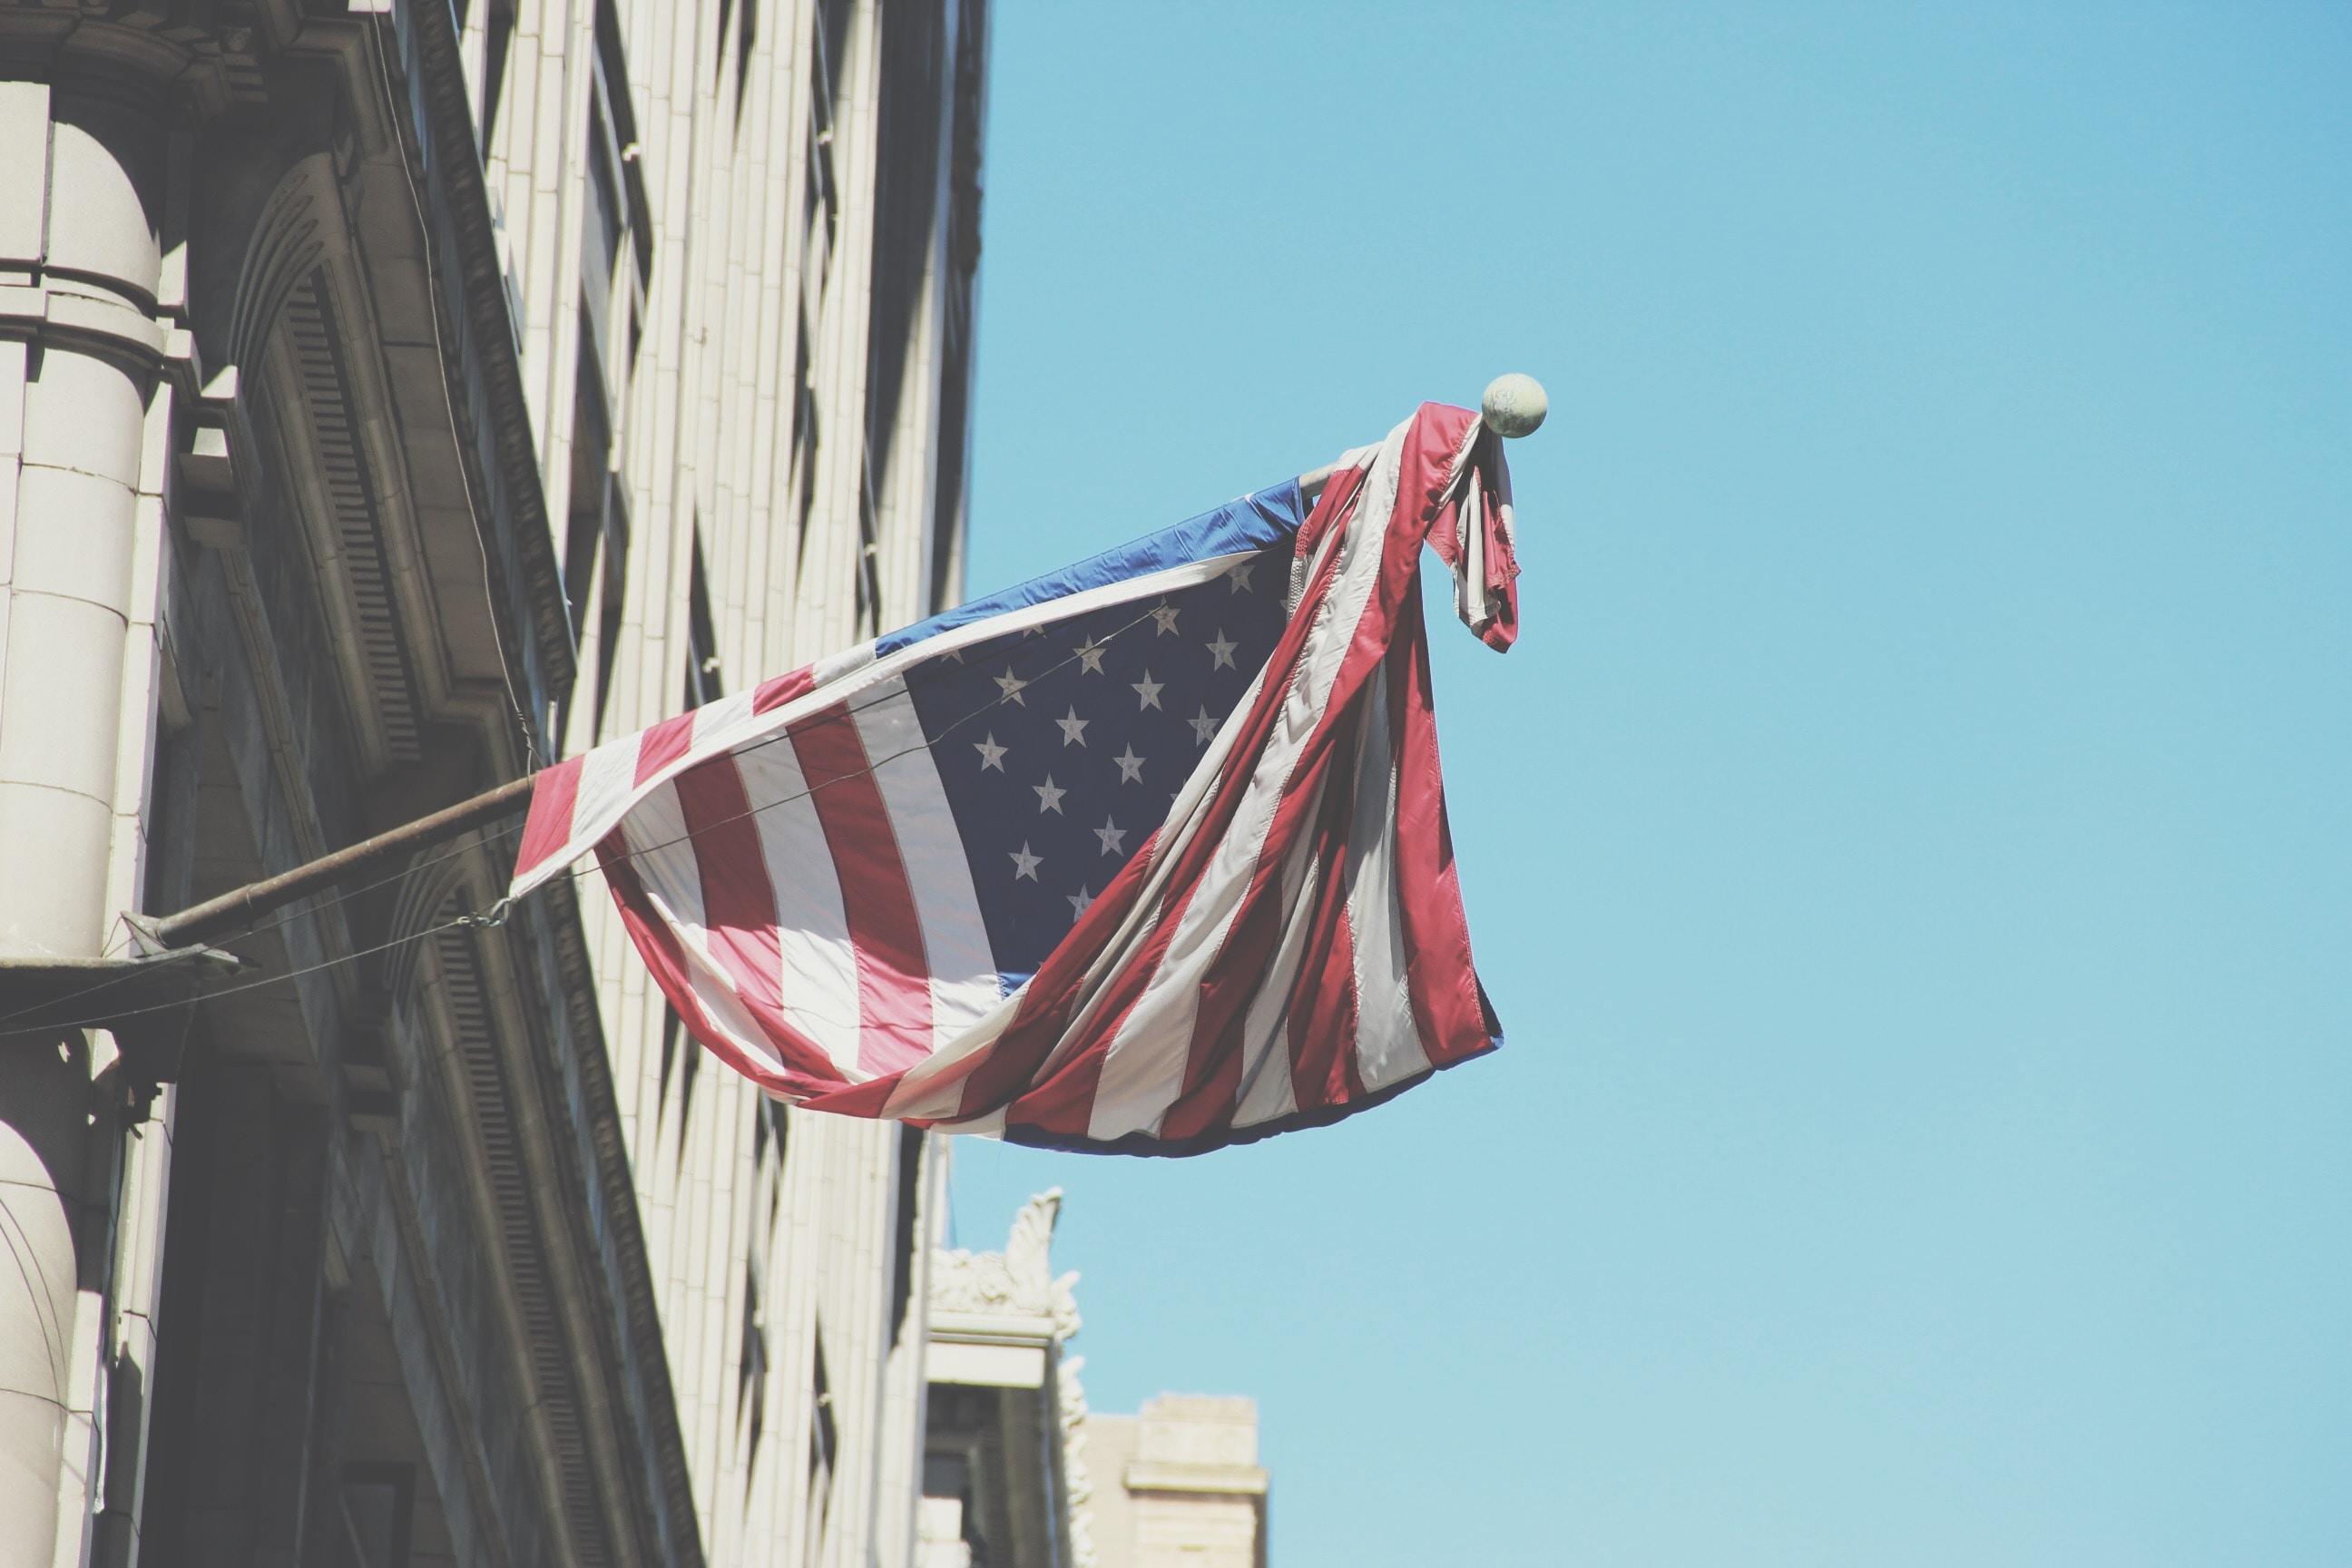 USA flag on building during daytime